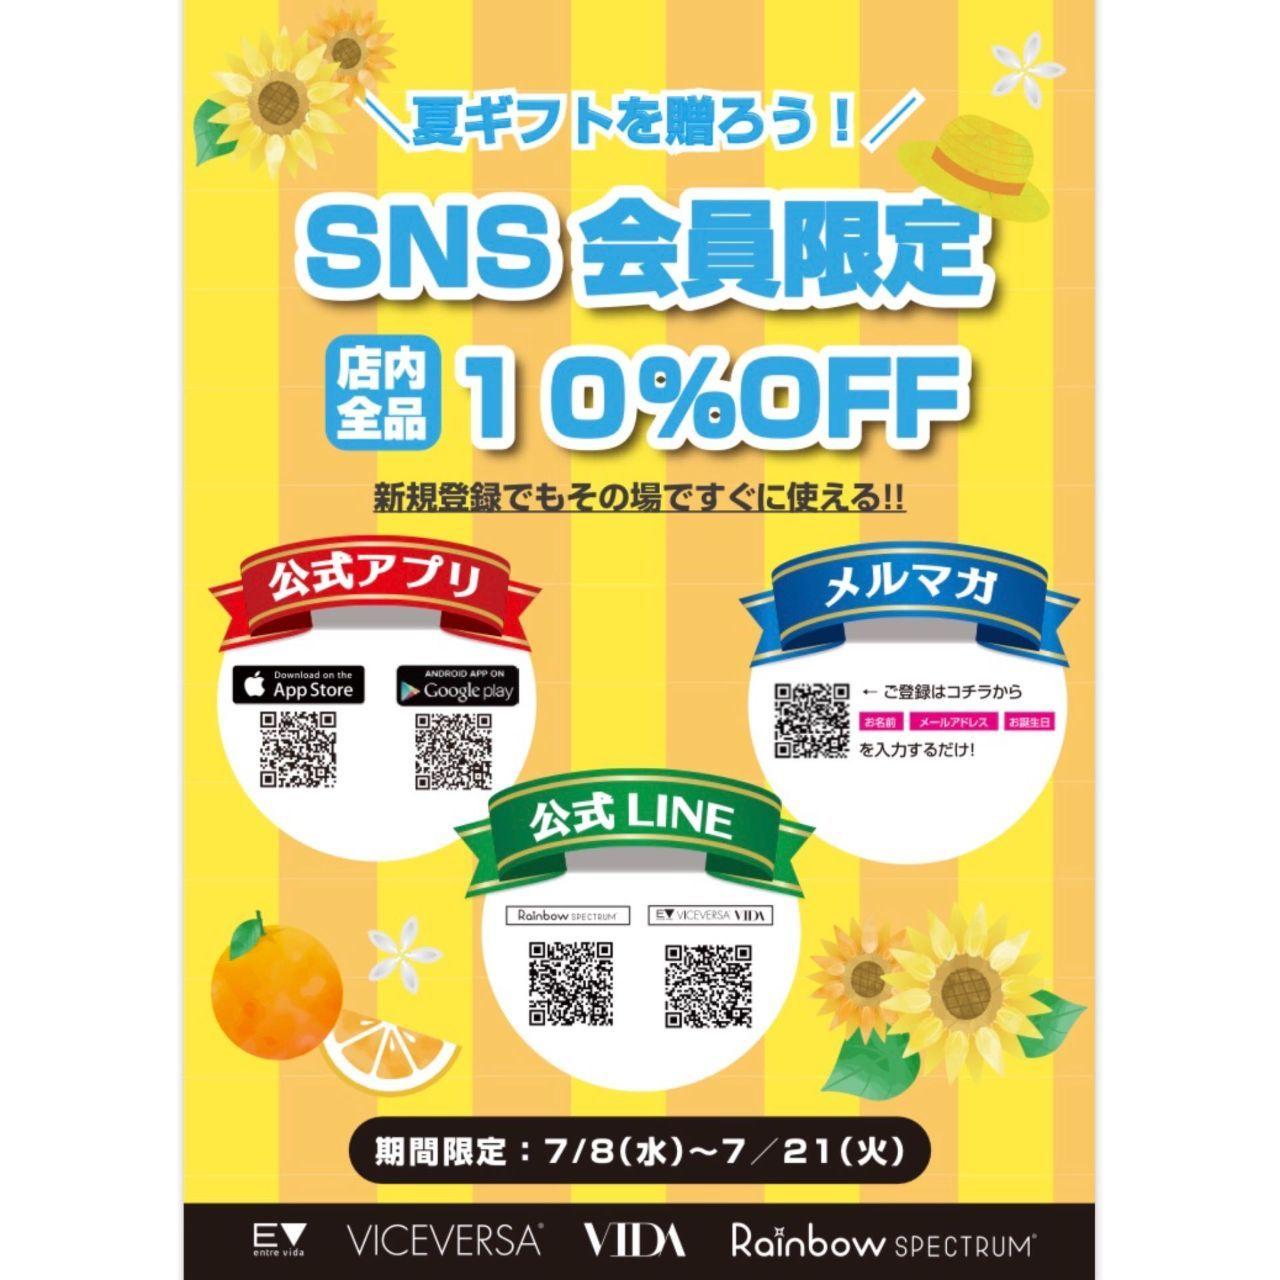 「【10%OFF】SNSクーポン配布中!」の写真